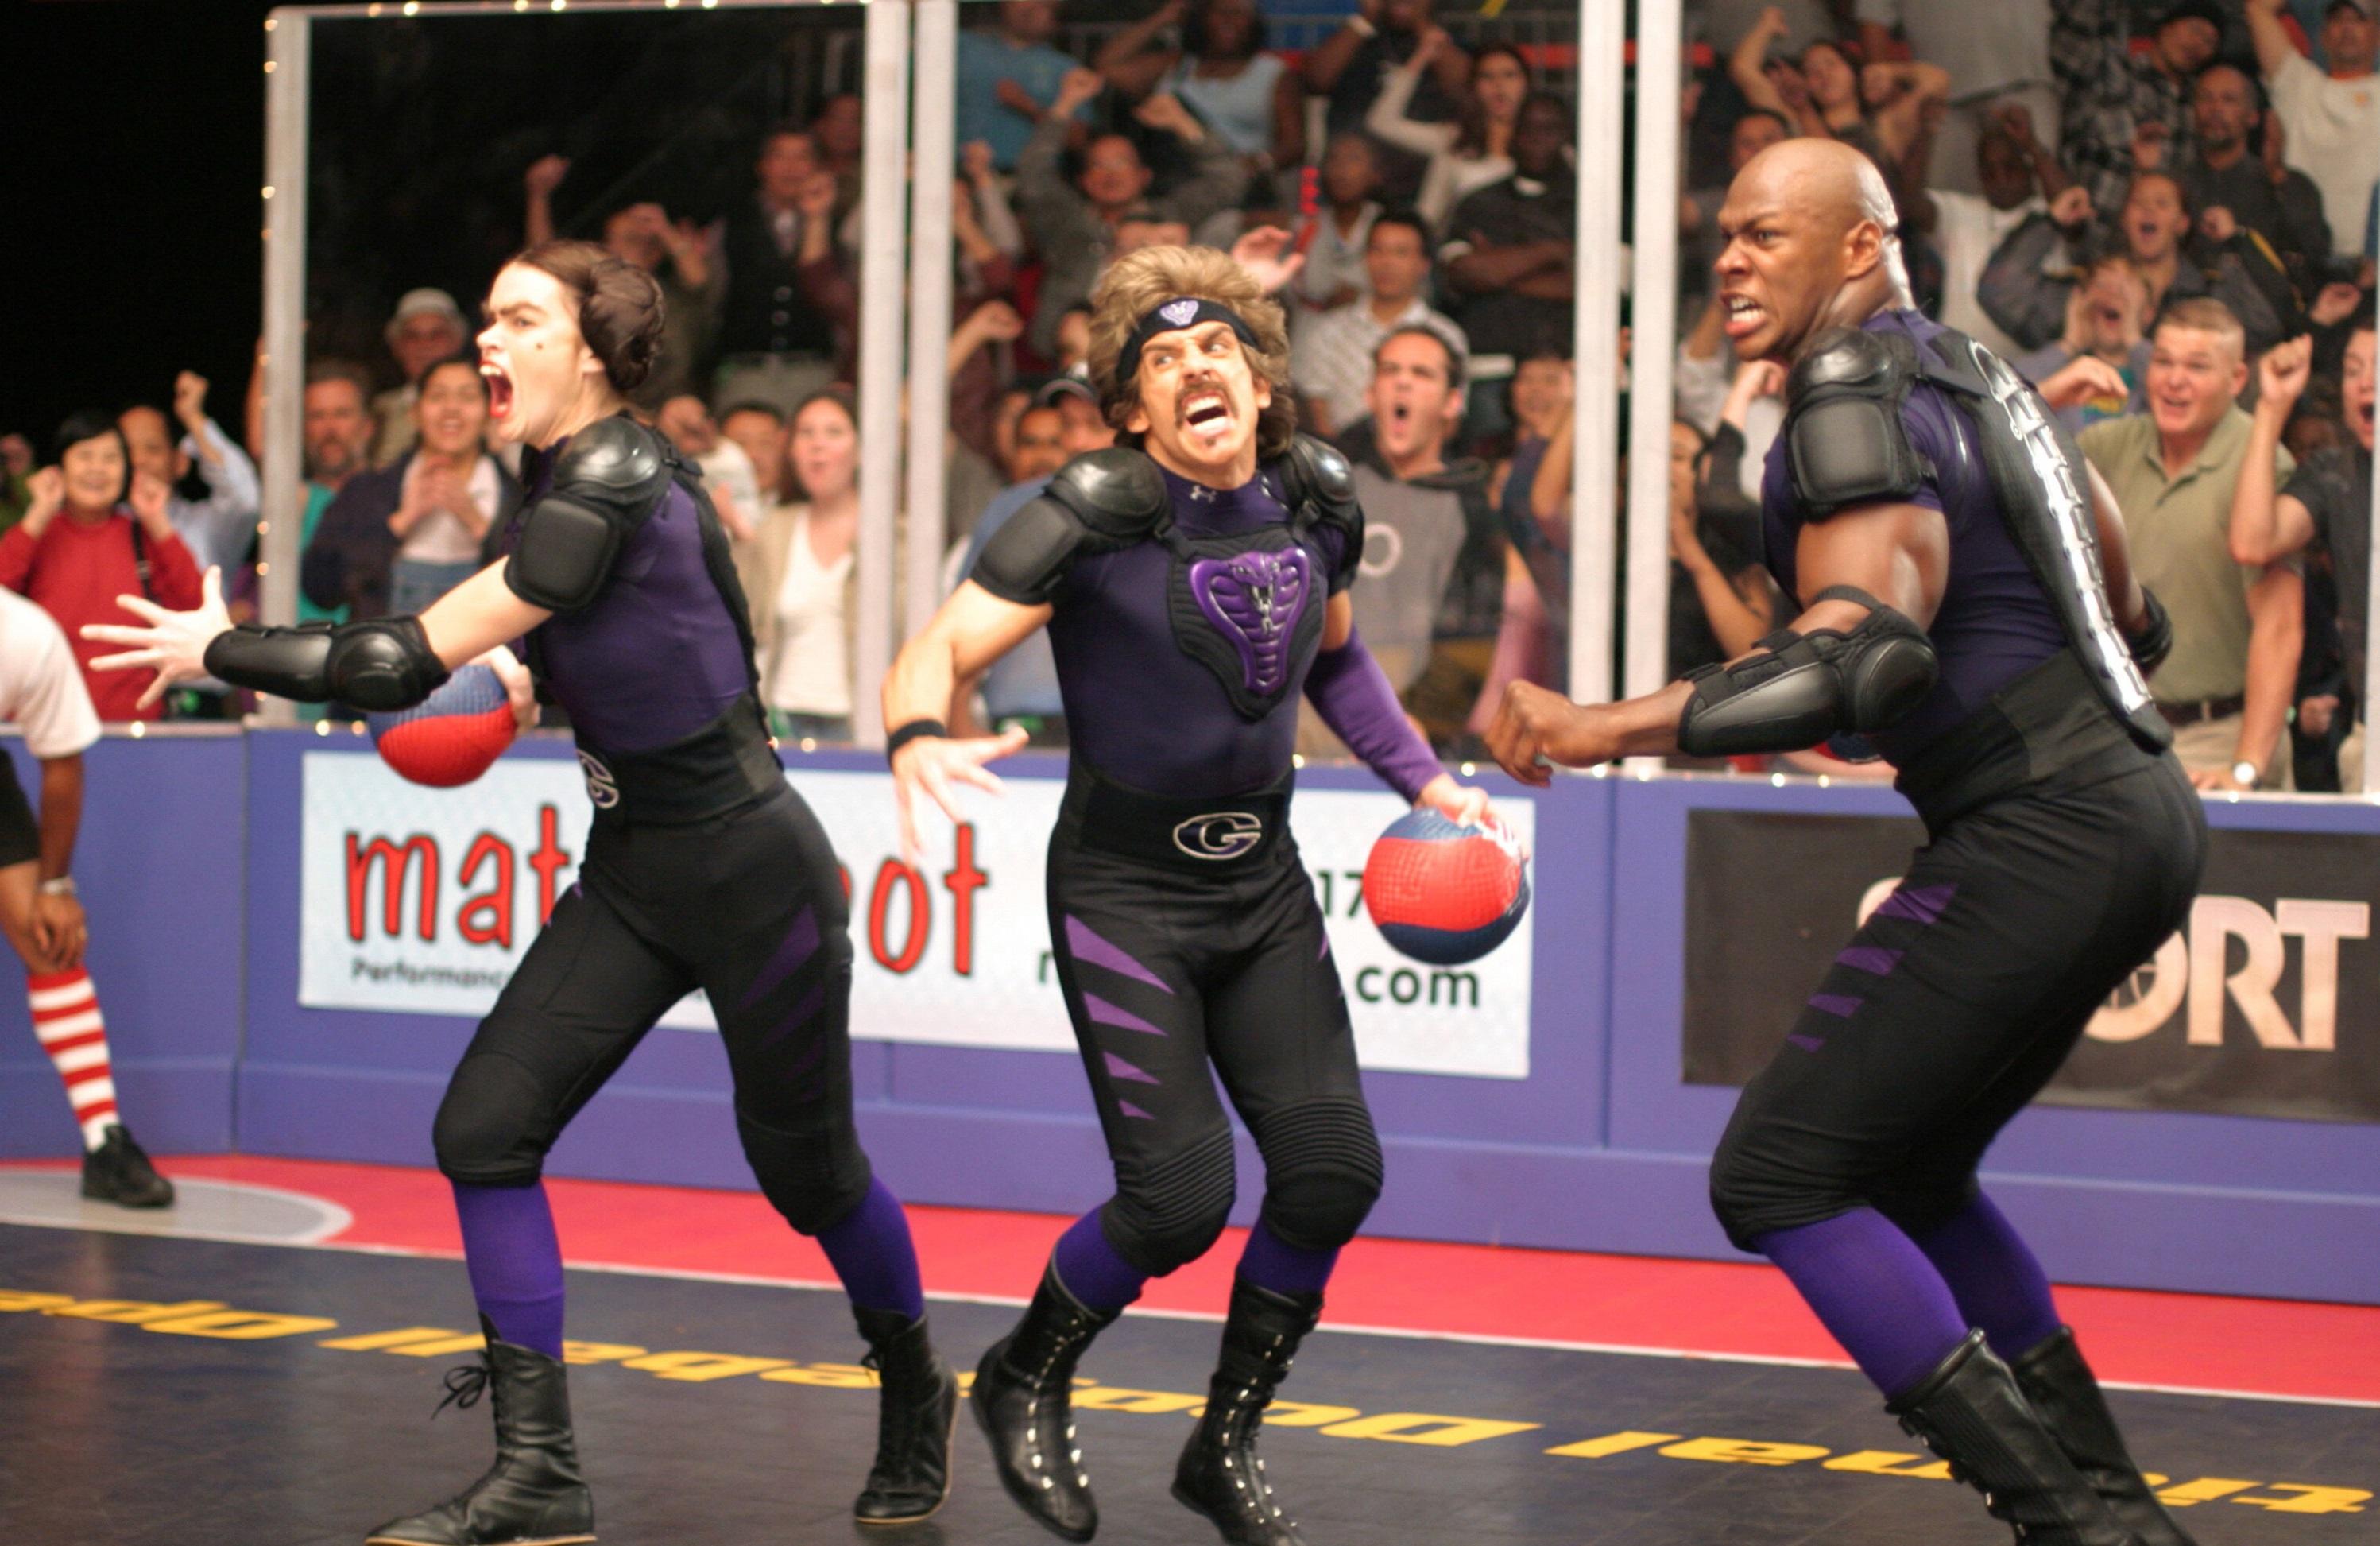 Missi Pyle, Ben Stiller, Jamal E. Duff, Dodgeball: A True Underdog Story